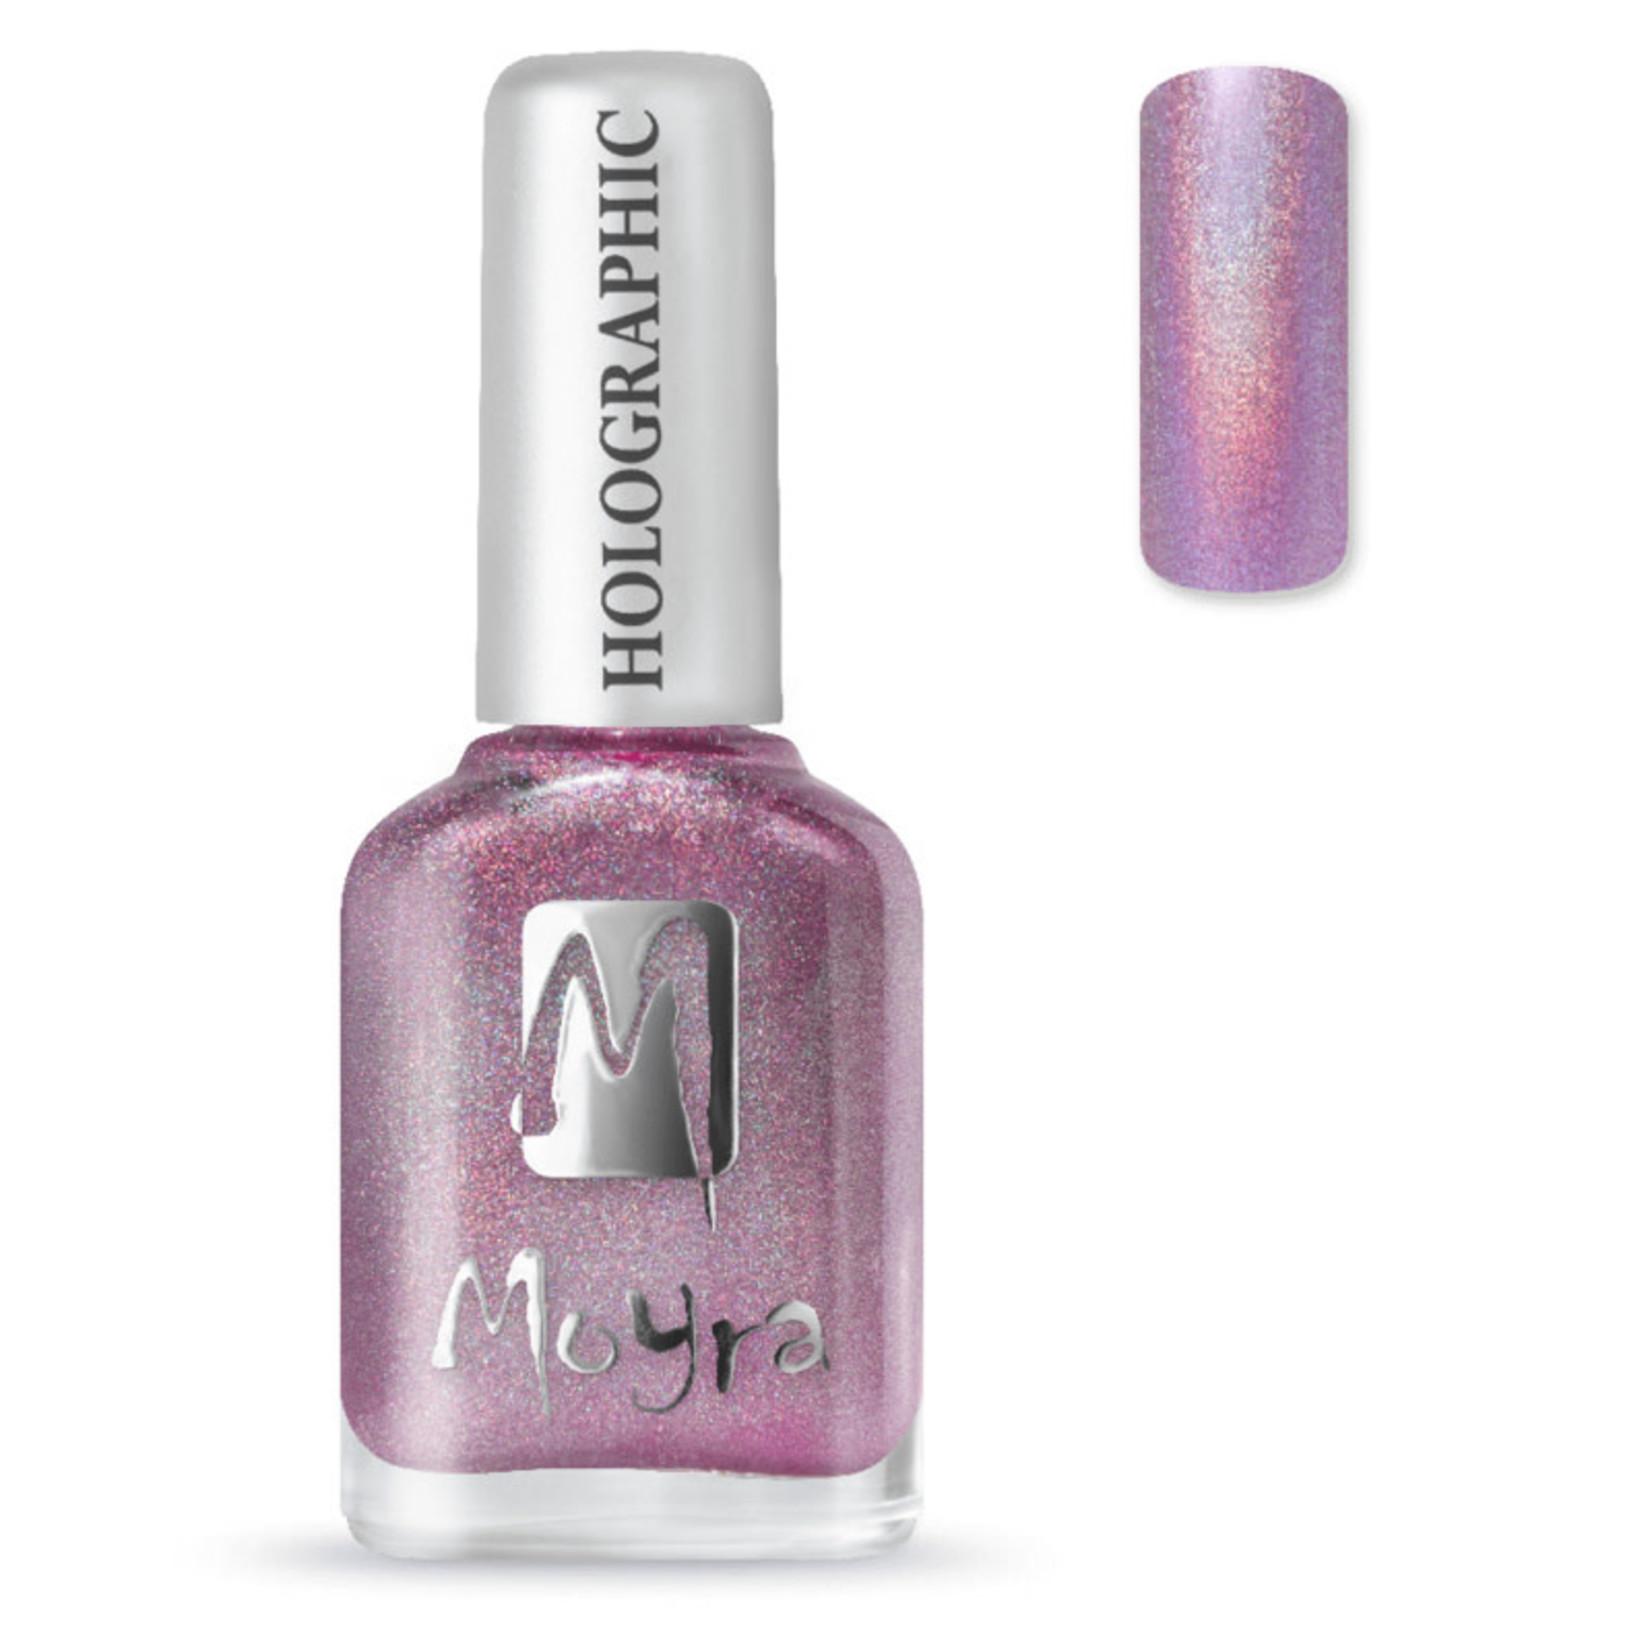 Moyra Moyra Holographic effect nail polish 255 Gravity